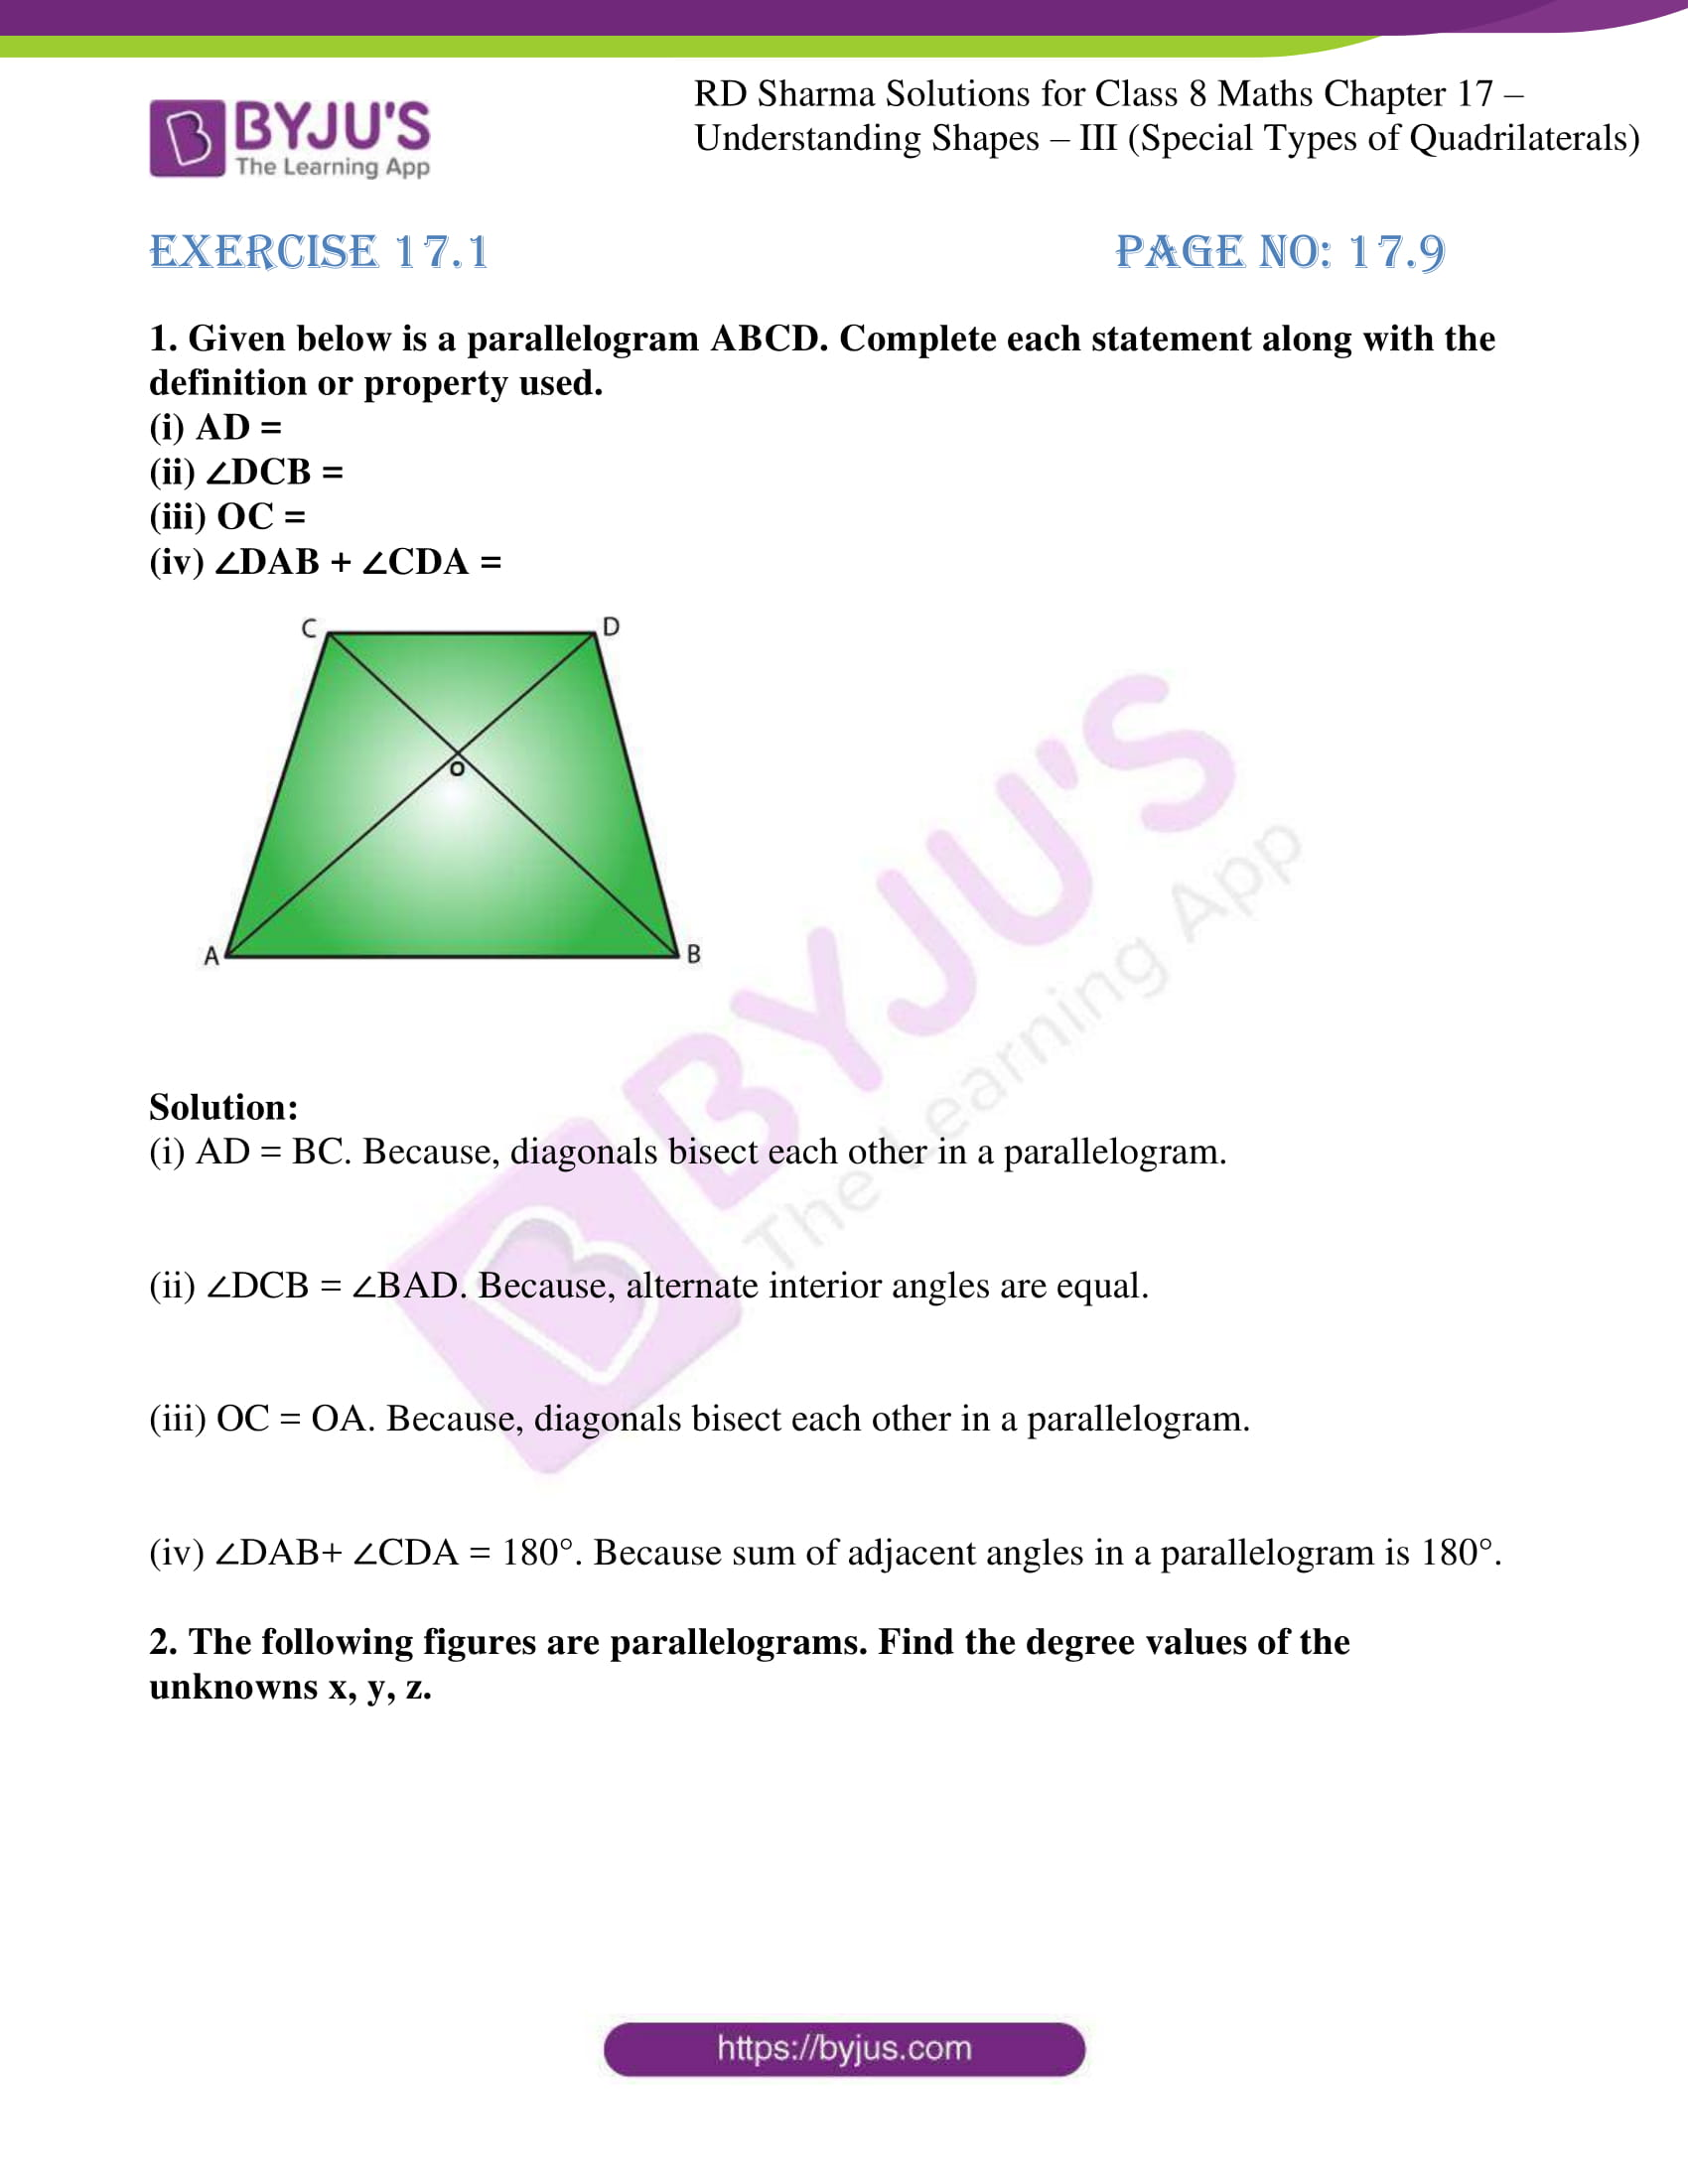 rd sharma class 8 maths chapter 17 exercise 1